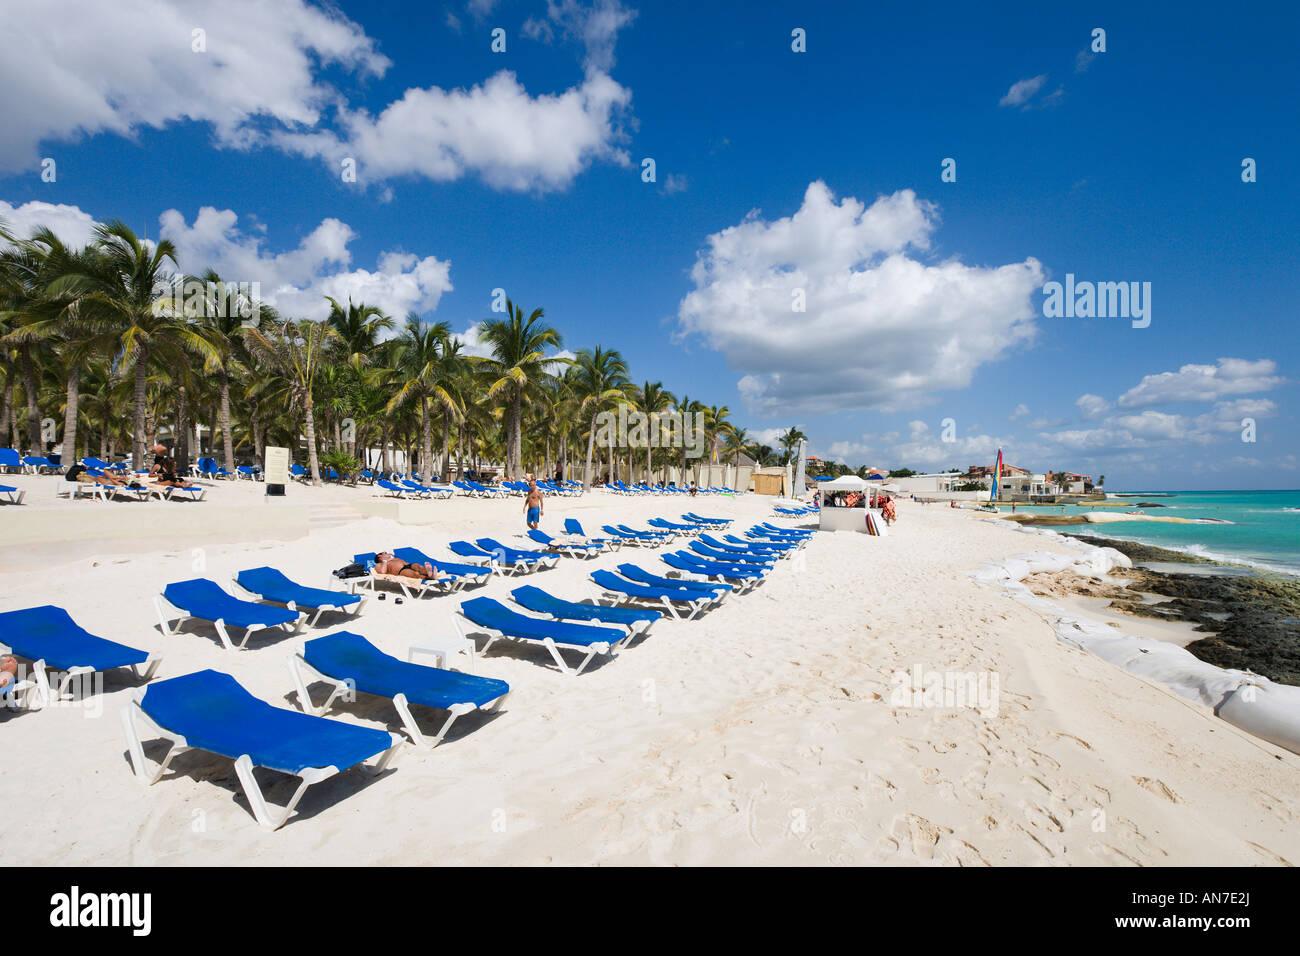 Hotel Riu Playacar Playa Del Carmen Mexico